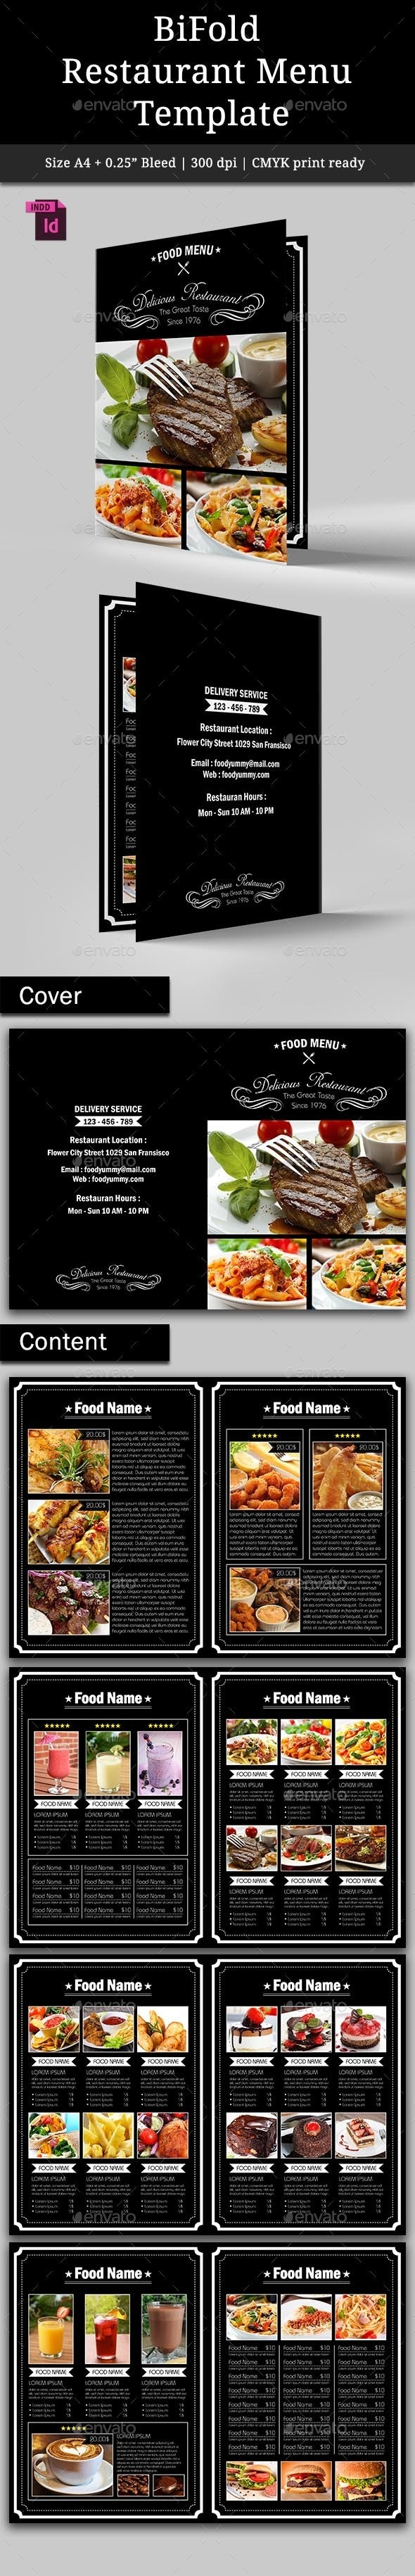 BiFold Restaurant Menu Vol. 2 - Food Menus Print Templates